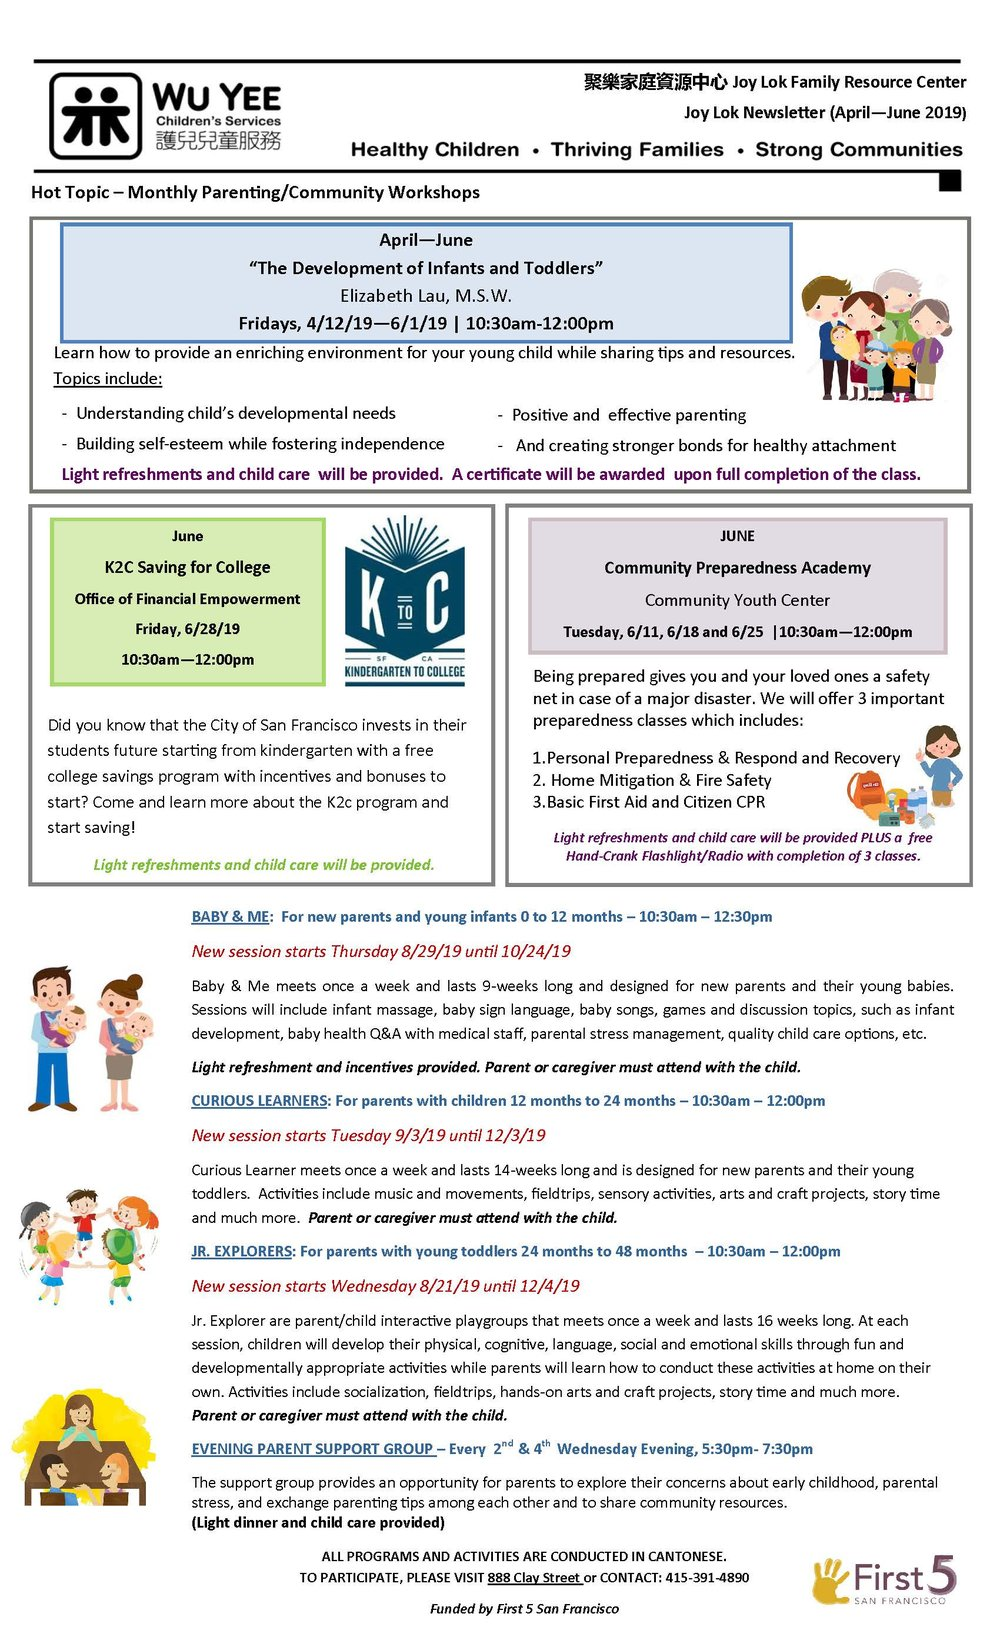 Joy Lok Family Resource Center — Wu Yee Children's Services